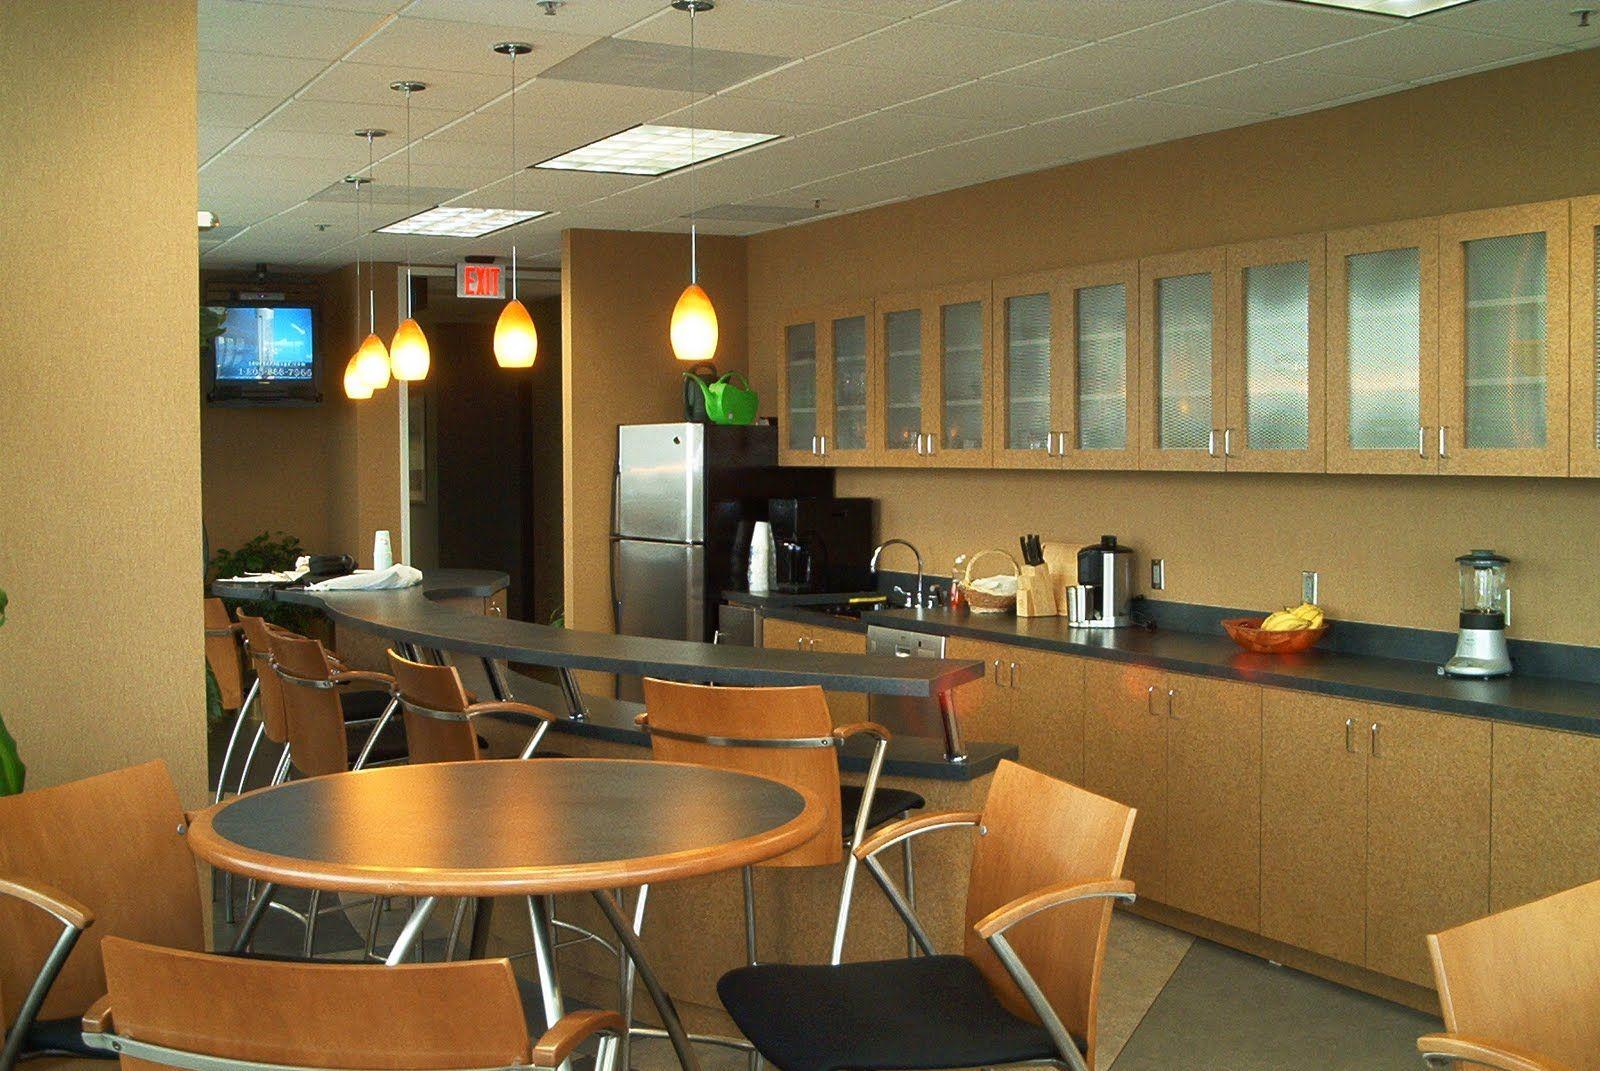 Office break room break room furniture ideas for Office break room ideas